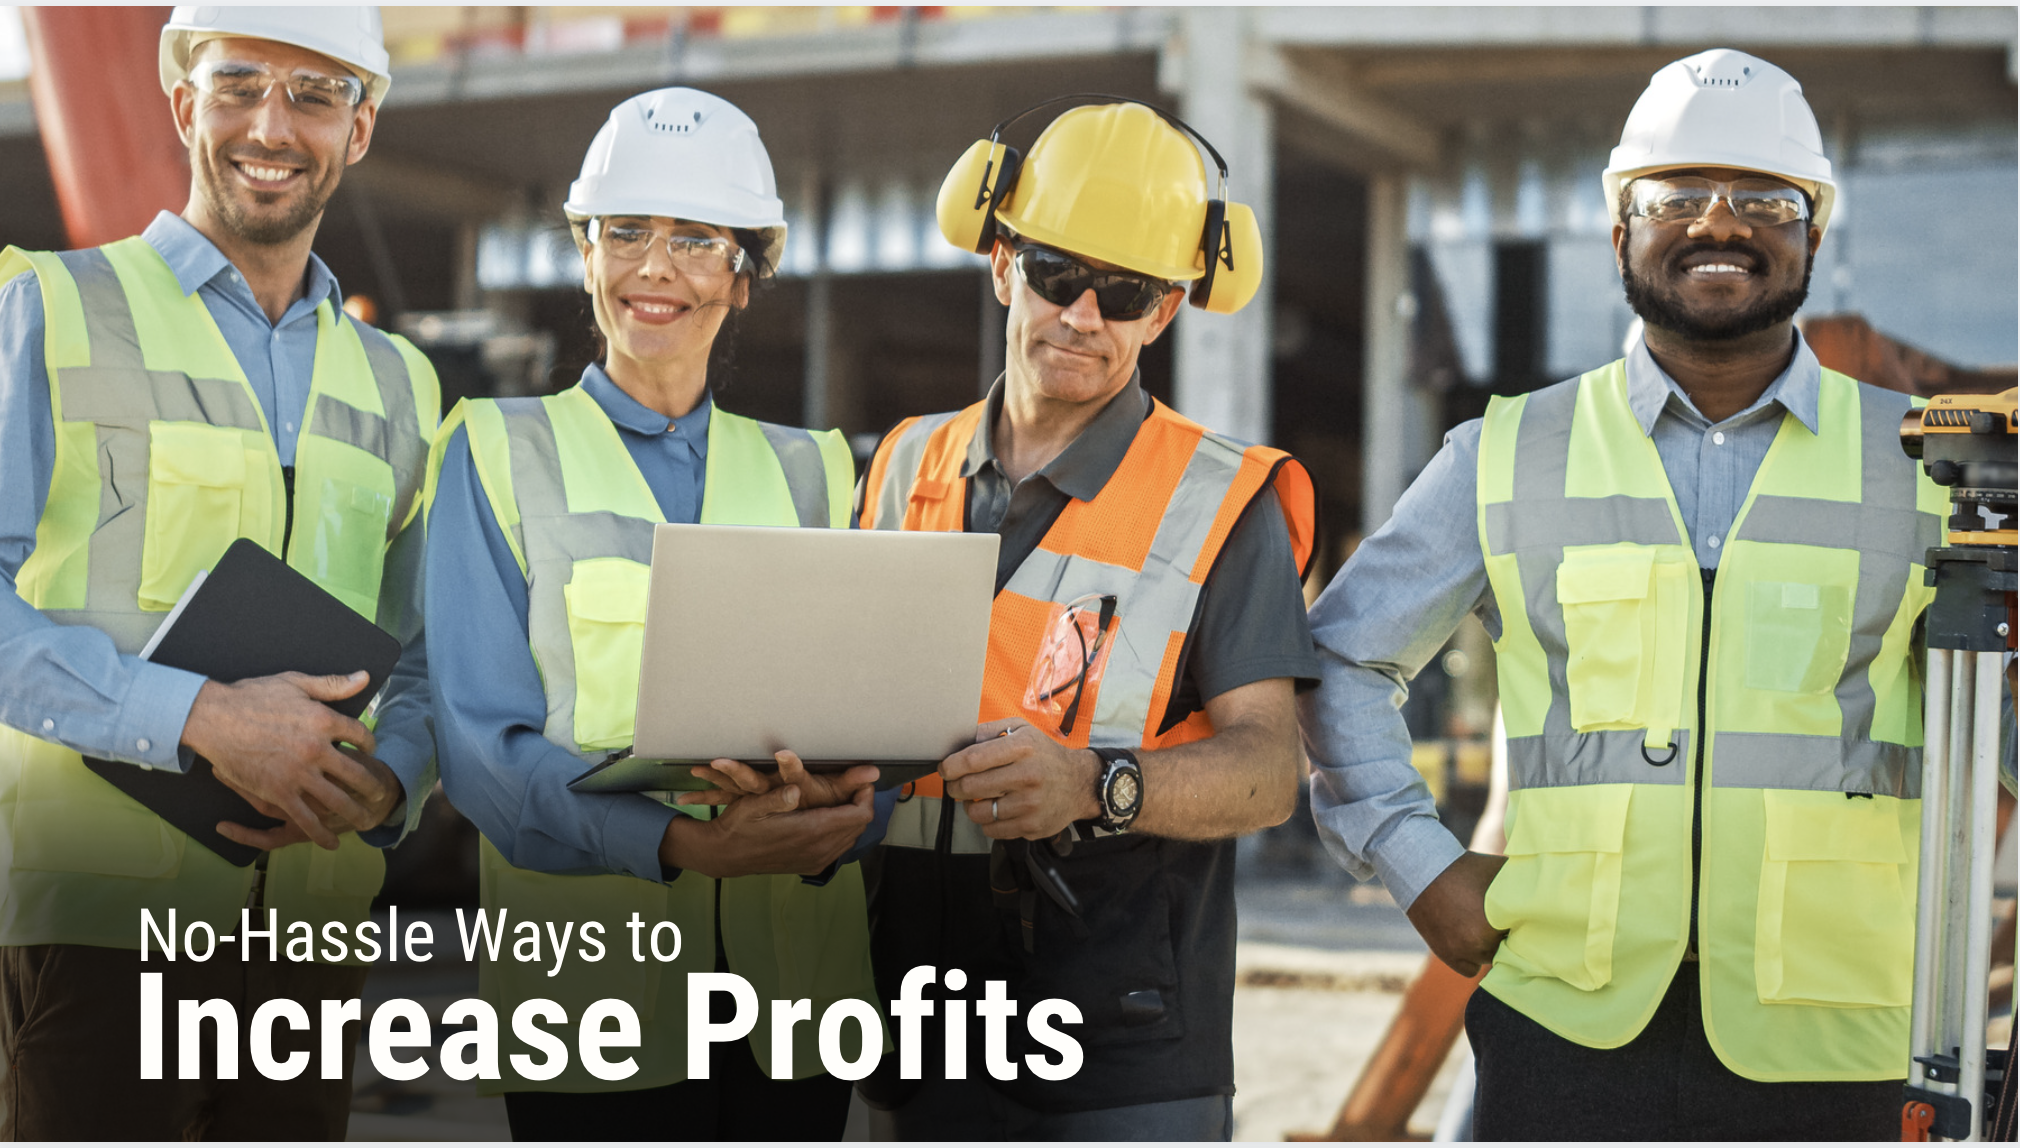 5 No-Hassle Ways to Increase Profits